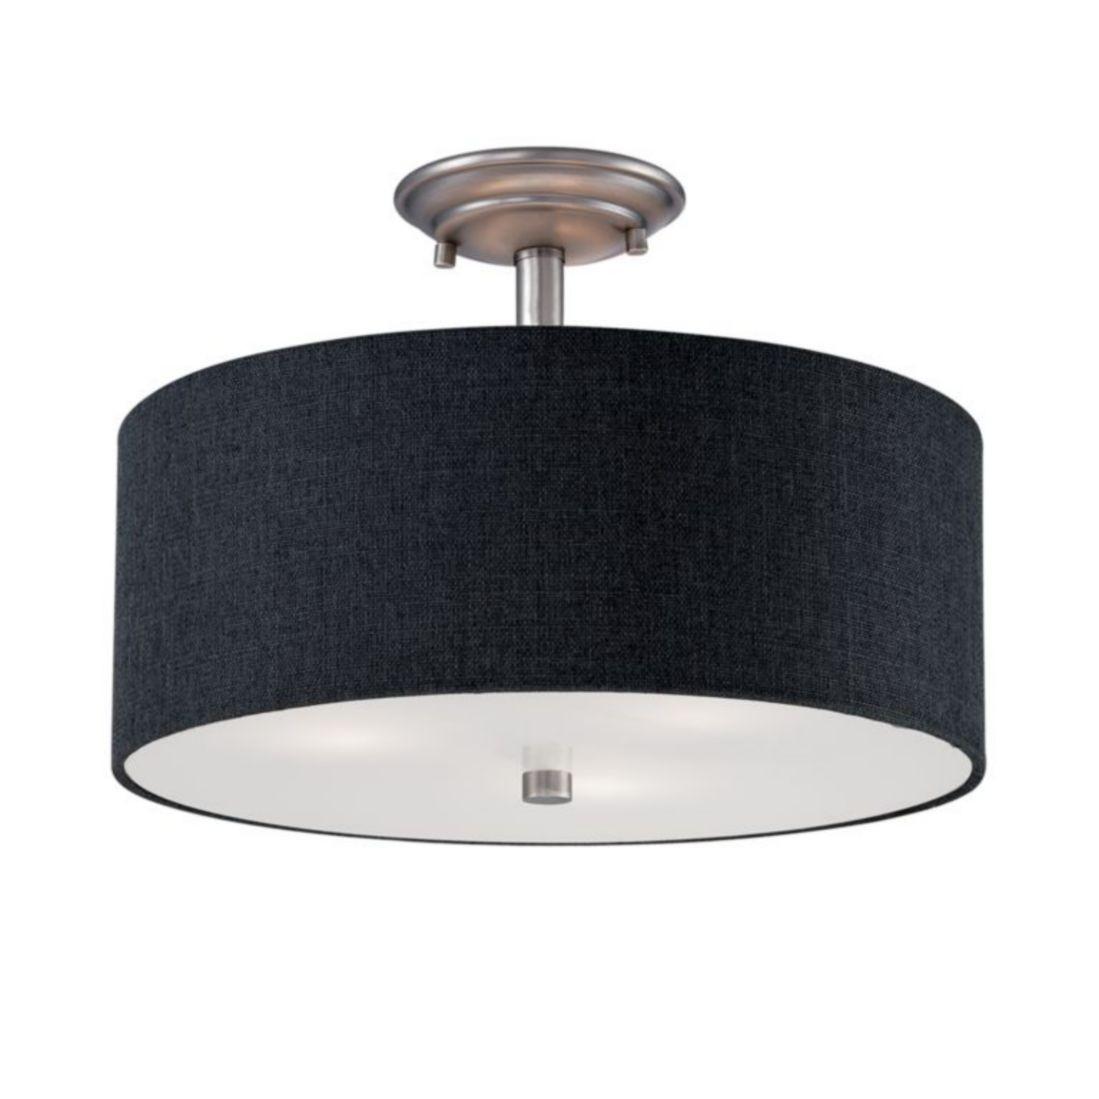 jackson pewter semi flush ceiling light drum shade 15 wx11 h 3123